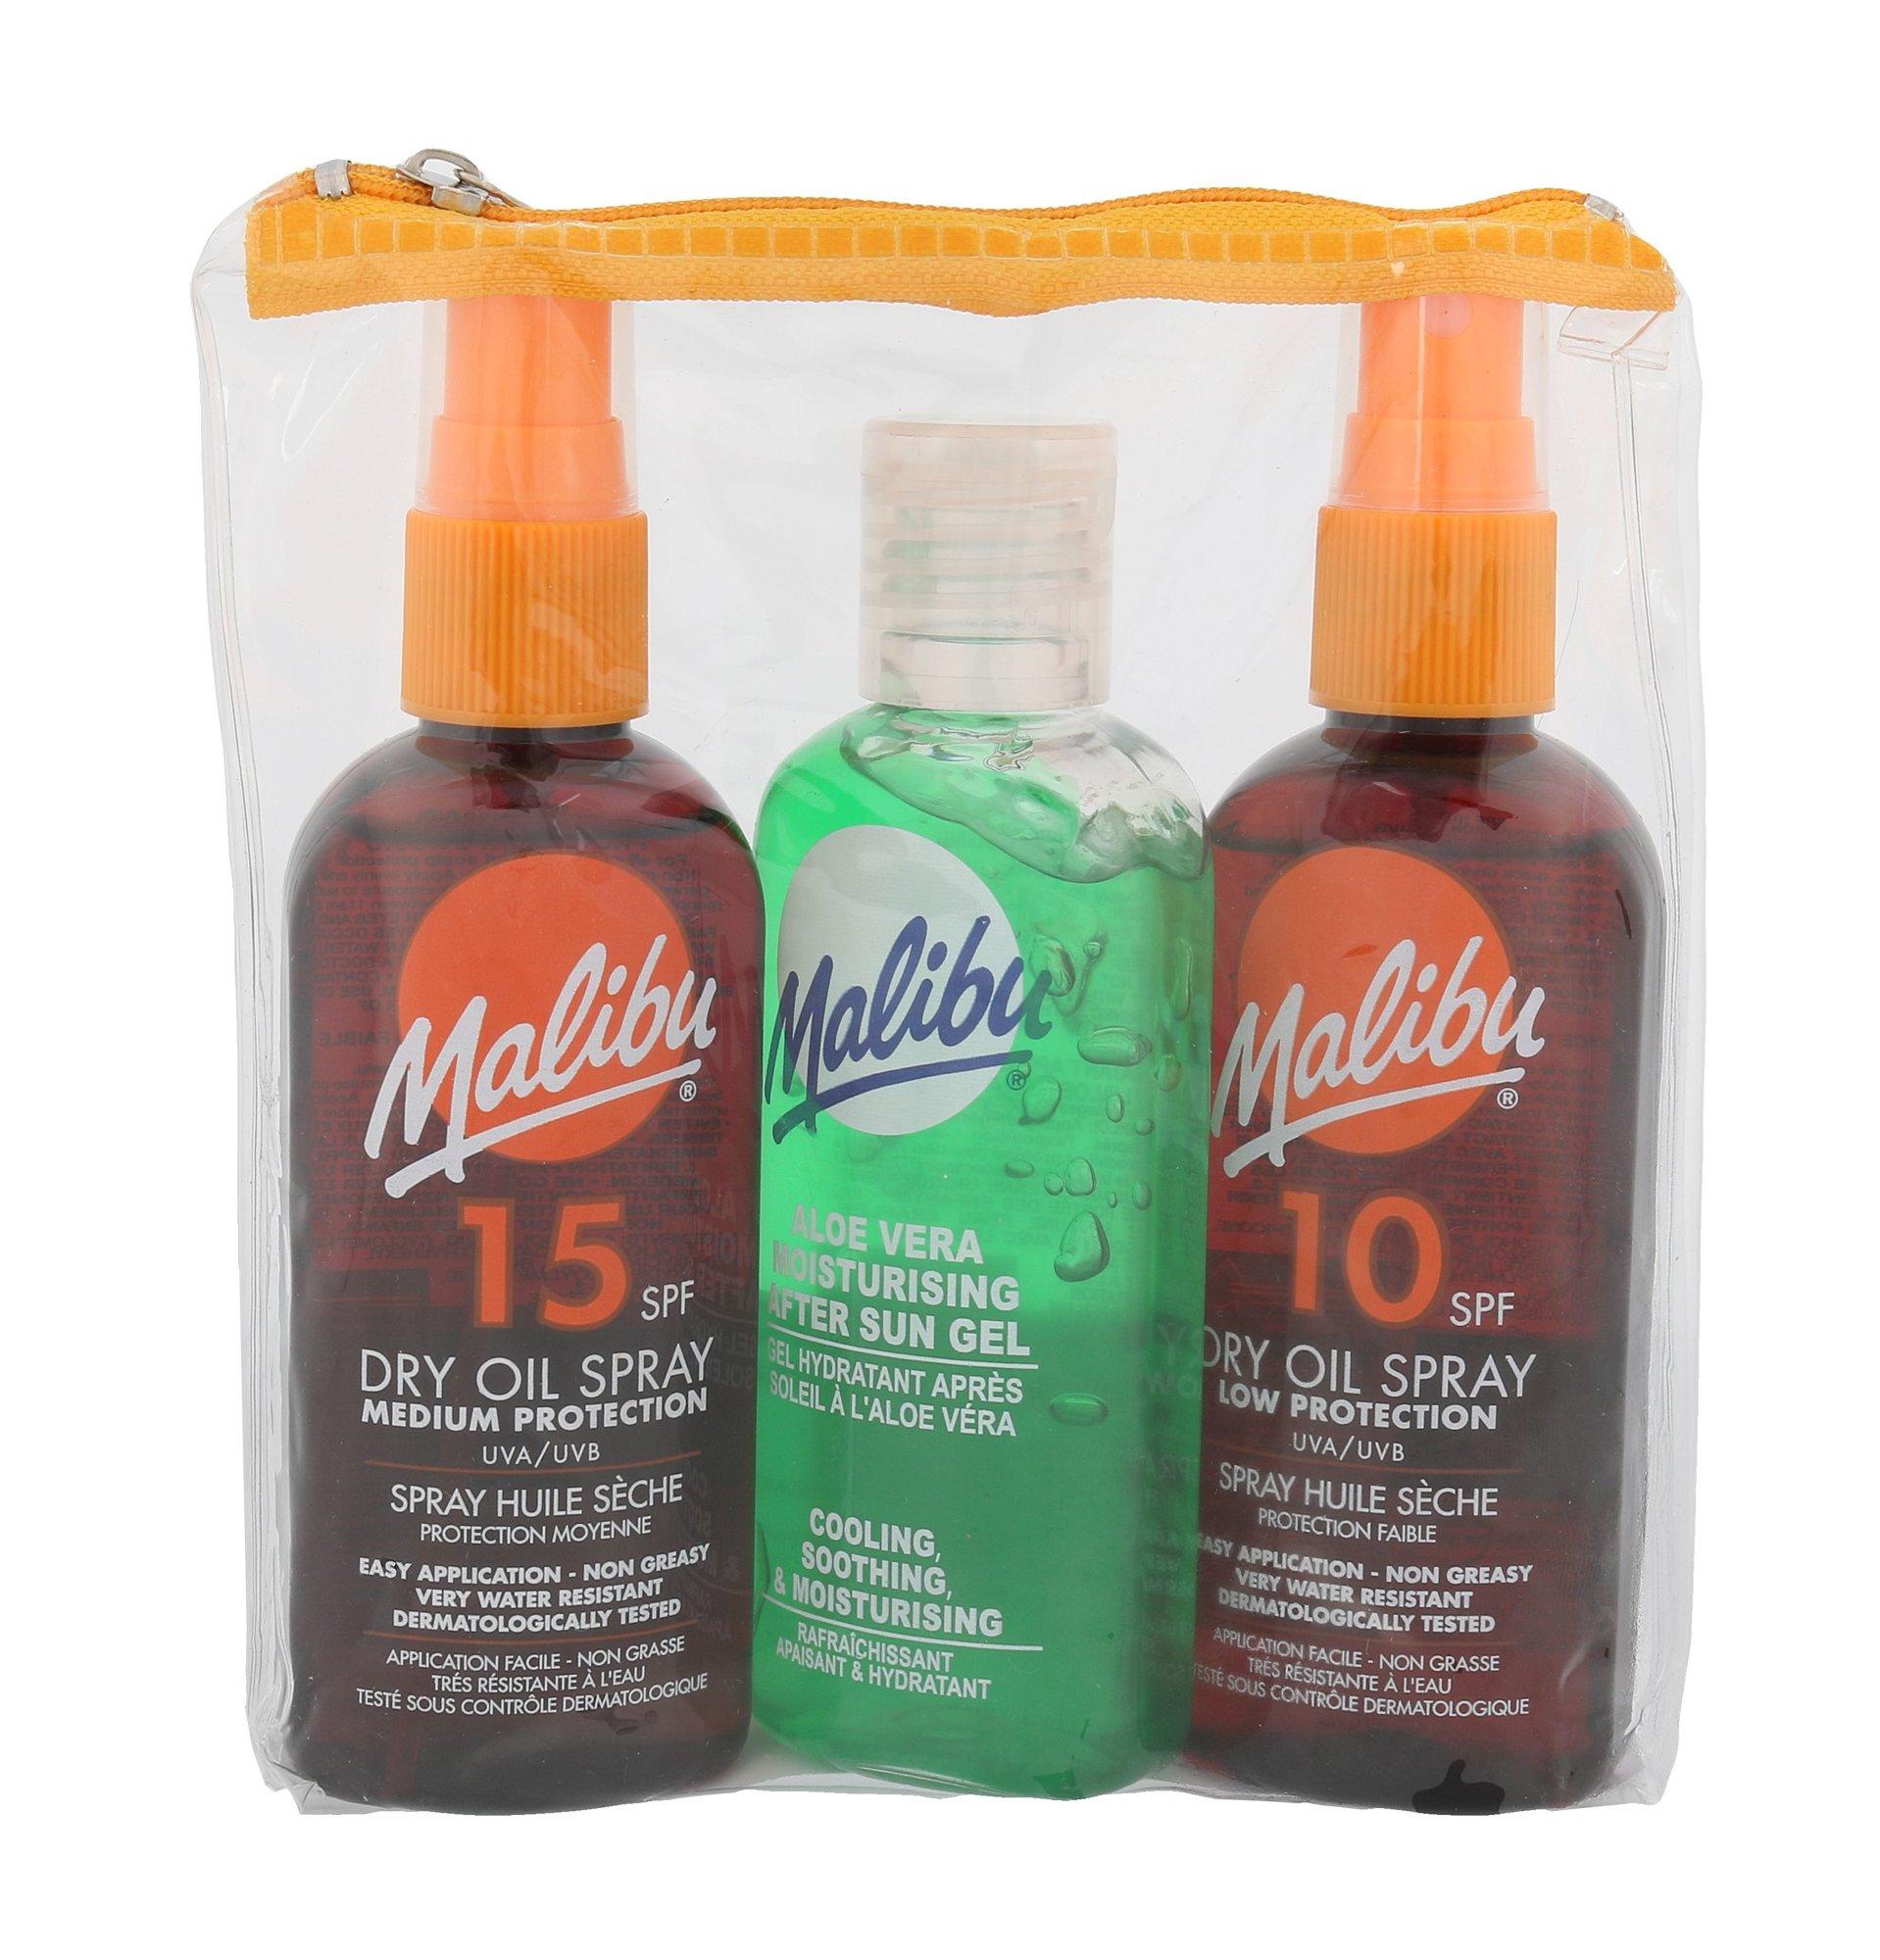 Malibu Dry Oil Spray Cosmetic 100ml